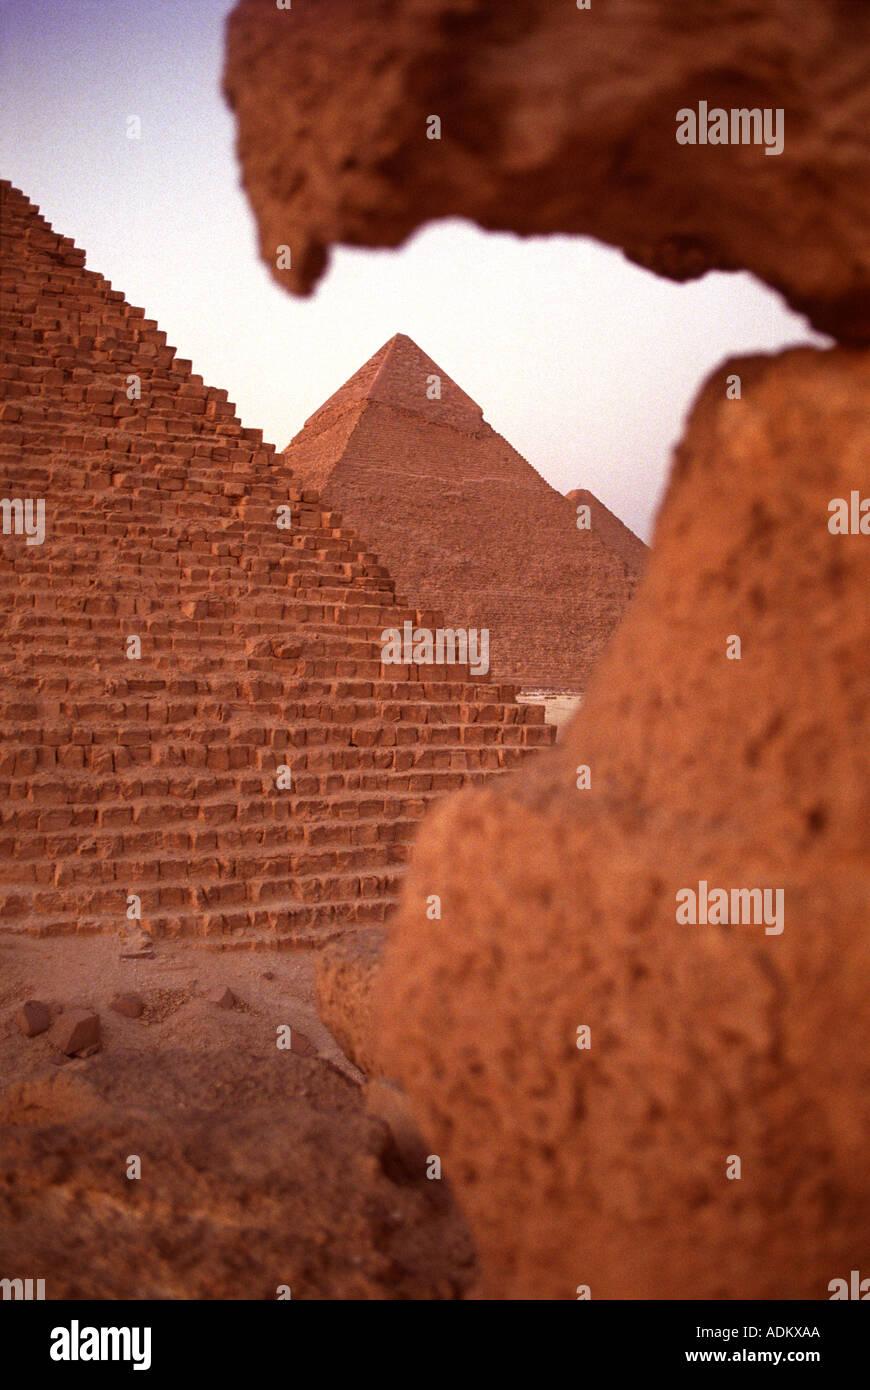 THE PYRAMIDS OF GIZA NEAR CAIRO EGYPT - Stock Image